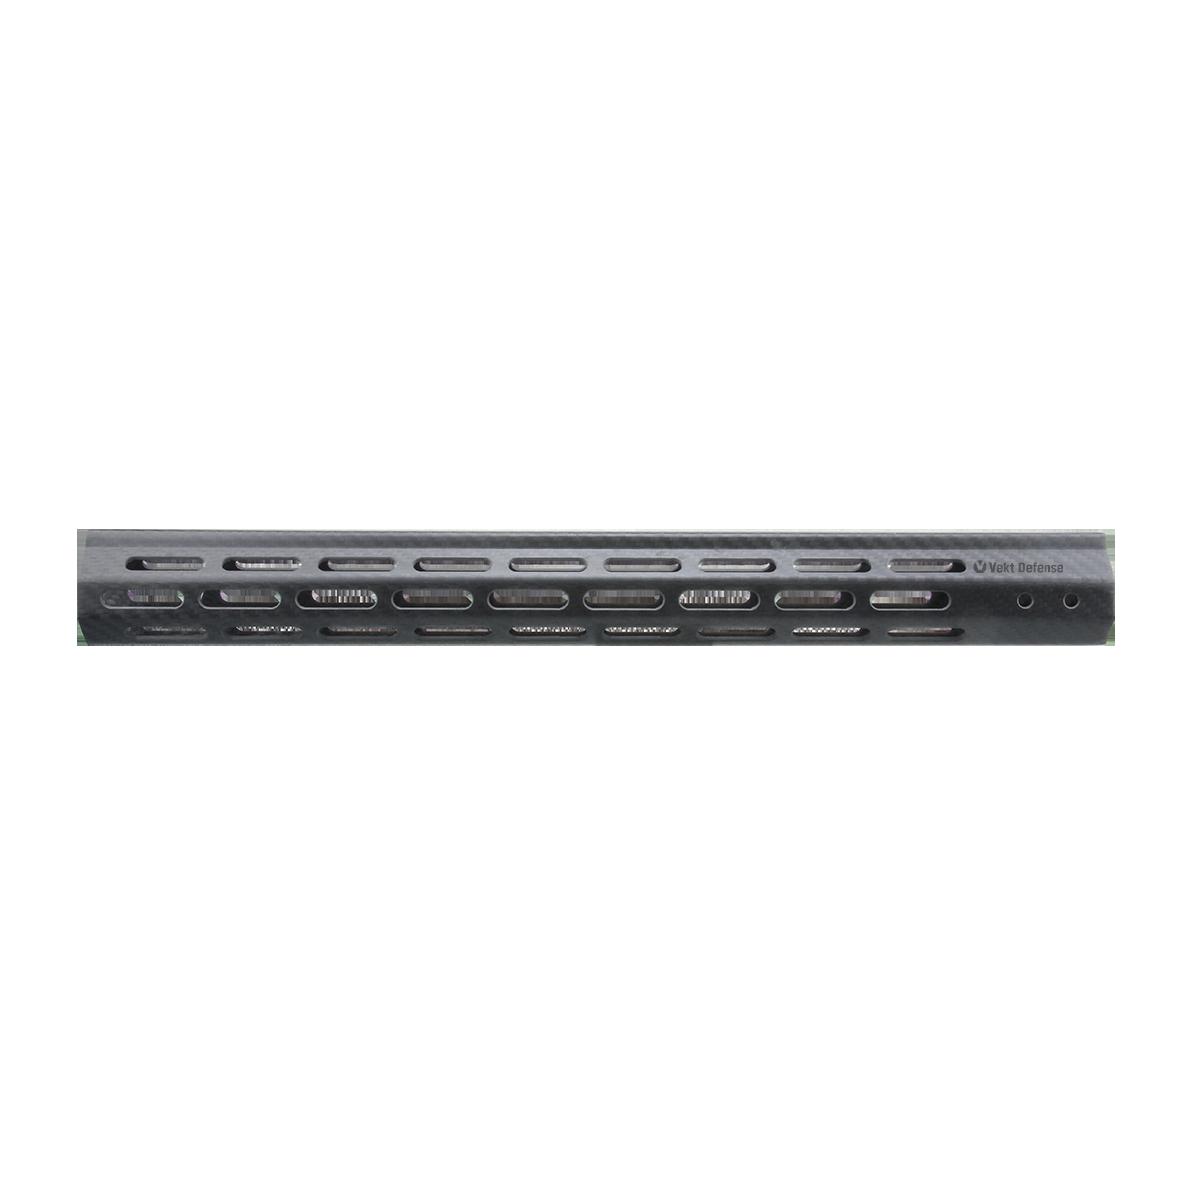 "Vector Optics Vekt Defense VDCF-17 Carbon Fiber 17"" Slim Handguard Rail Mount"